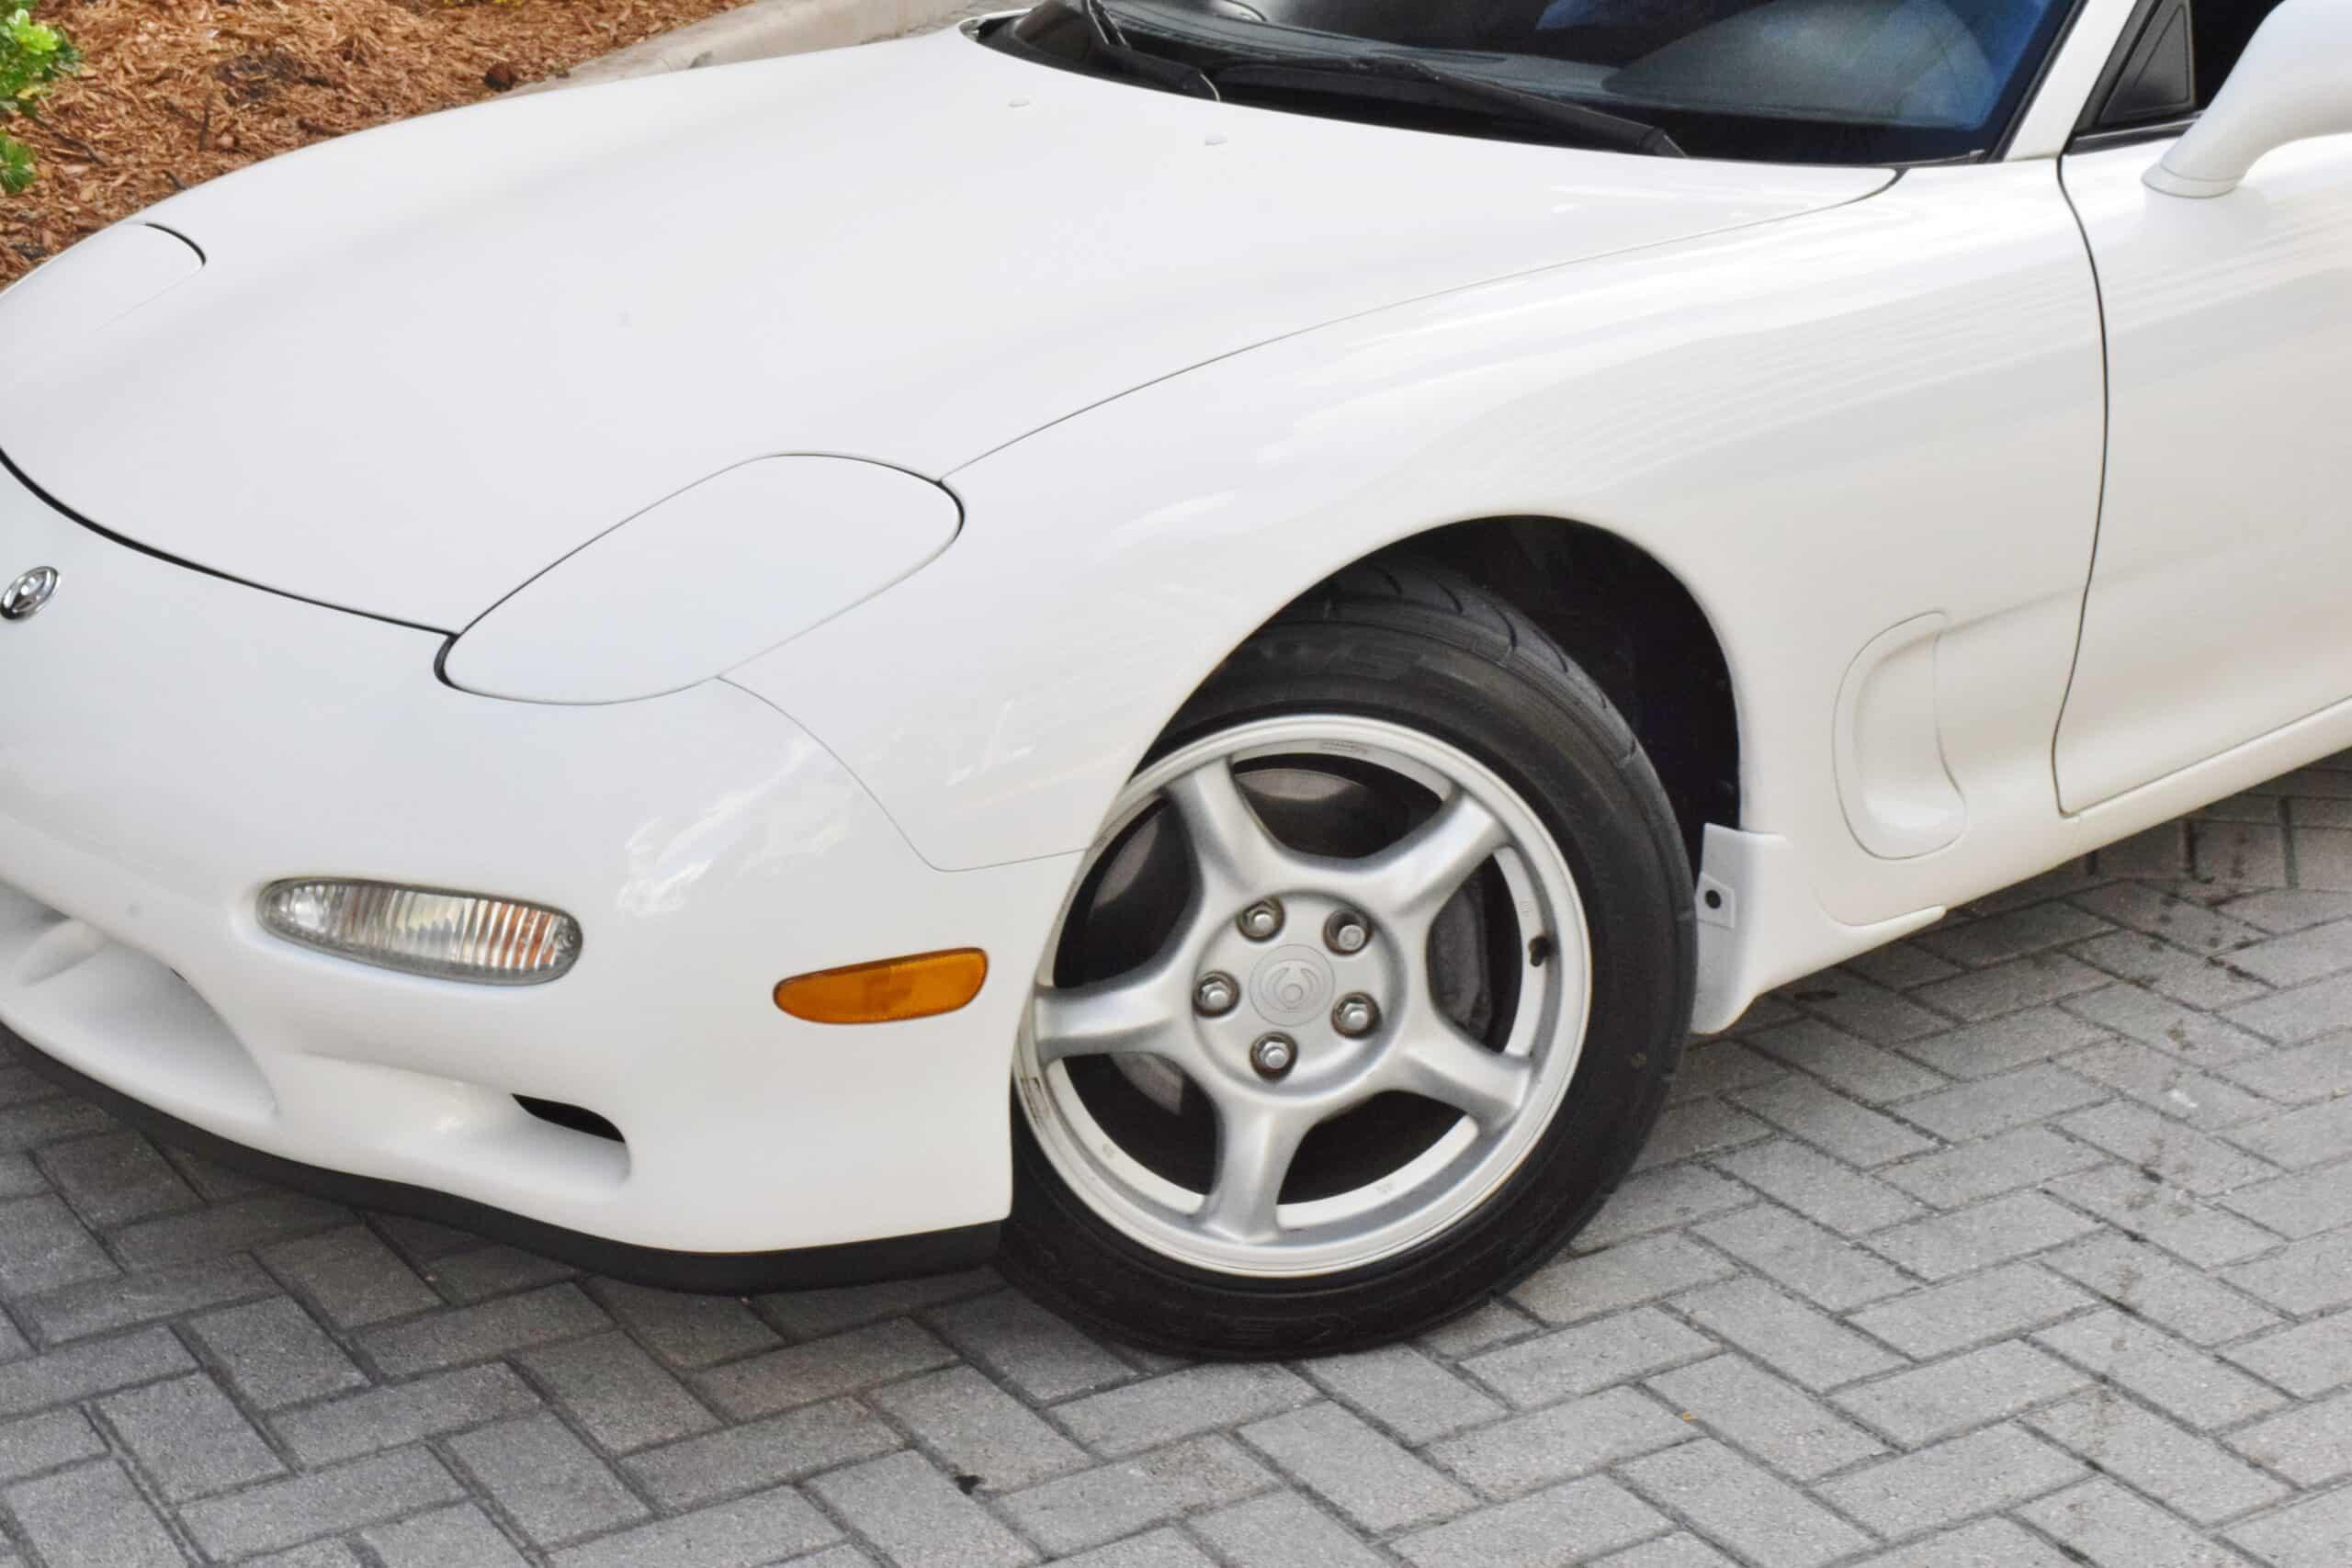 1994 Mazda RX-7 FD Turbo 100% Stock- Original Paint -ONLY 58K Miles – 1 of 26 USDM Chaste White SPEC Cars